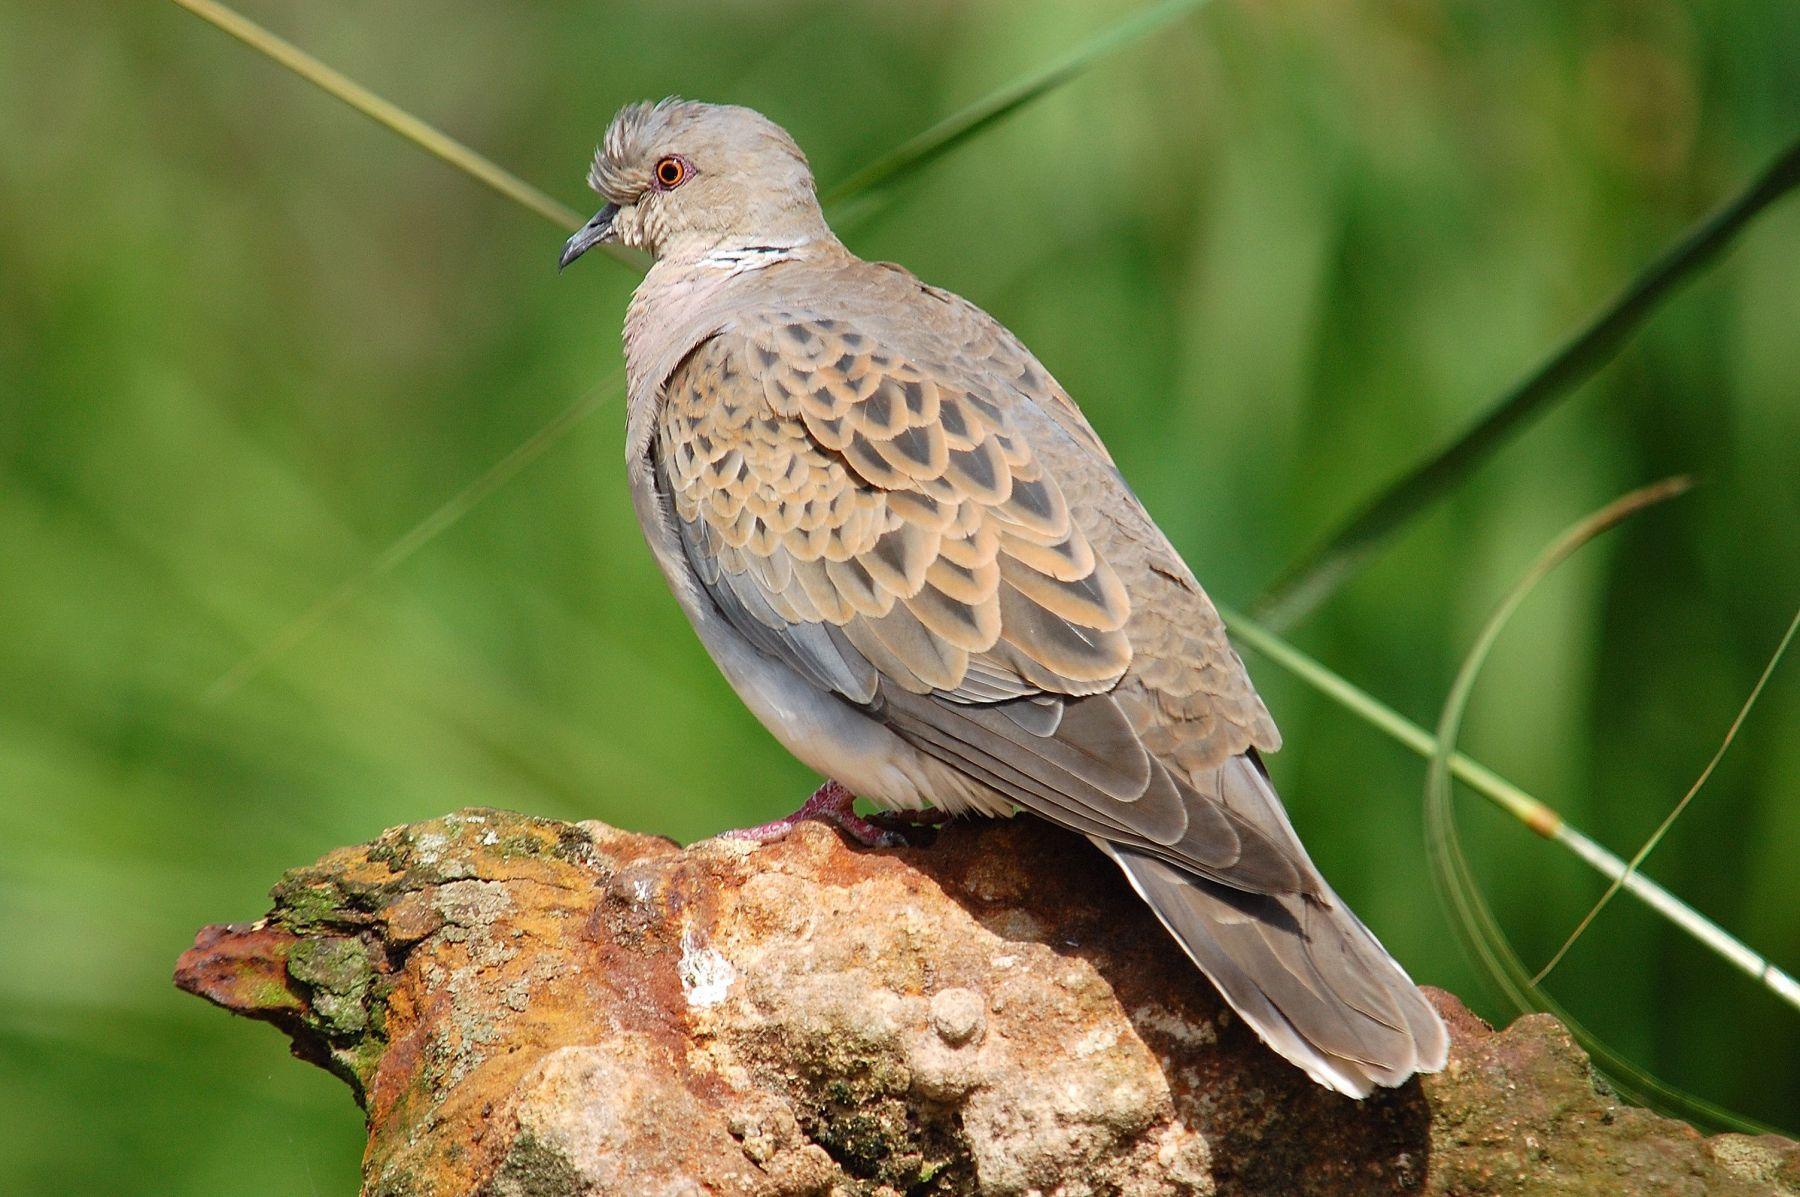 Endangered European Turtle Doves are again hunted in Malta